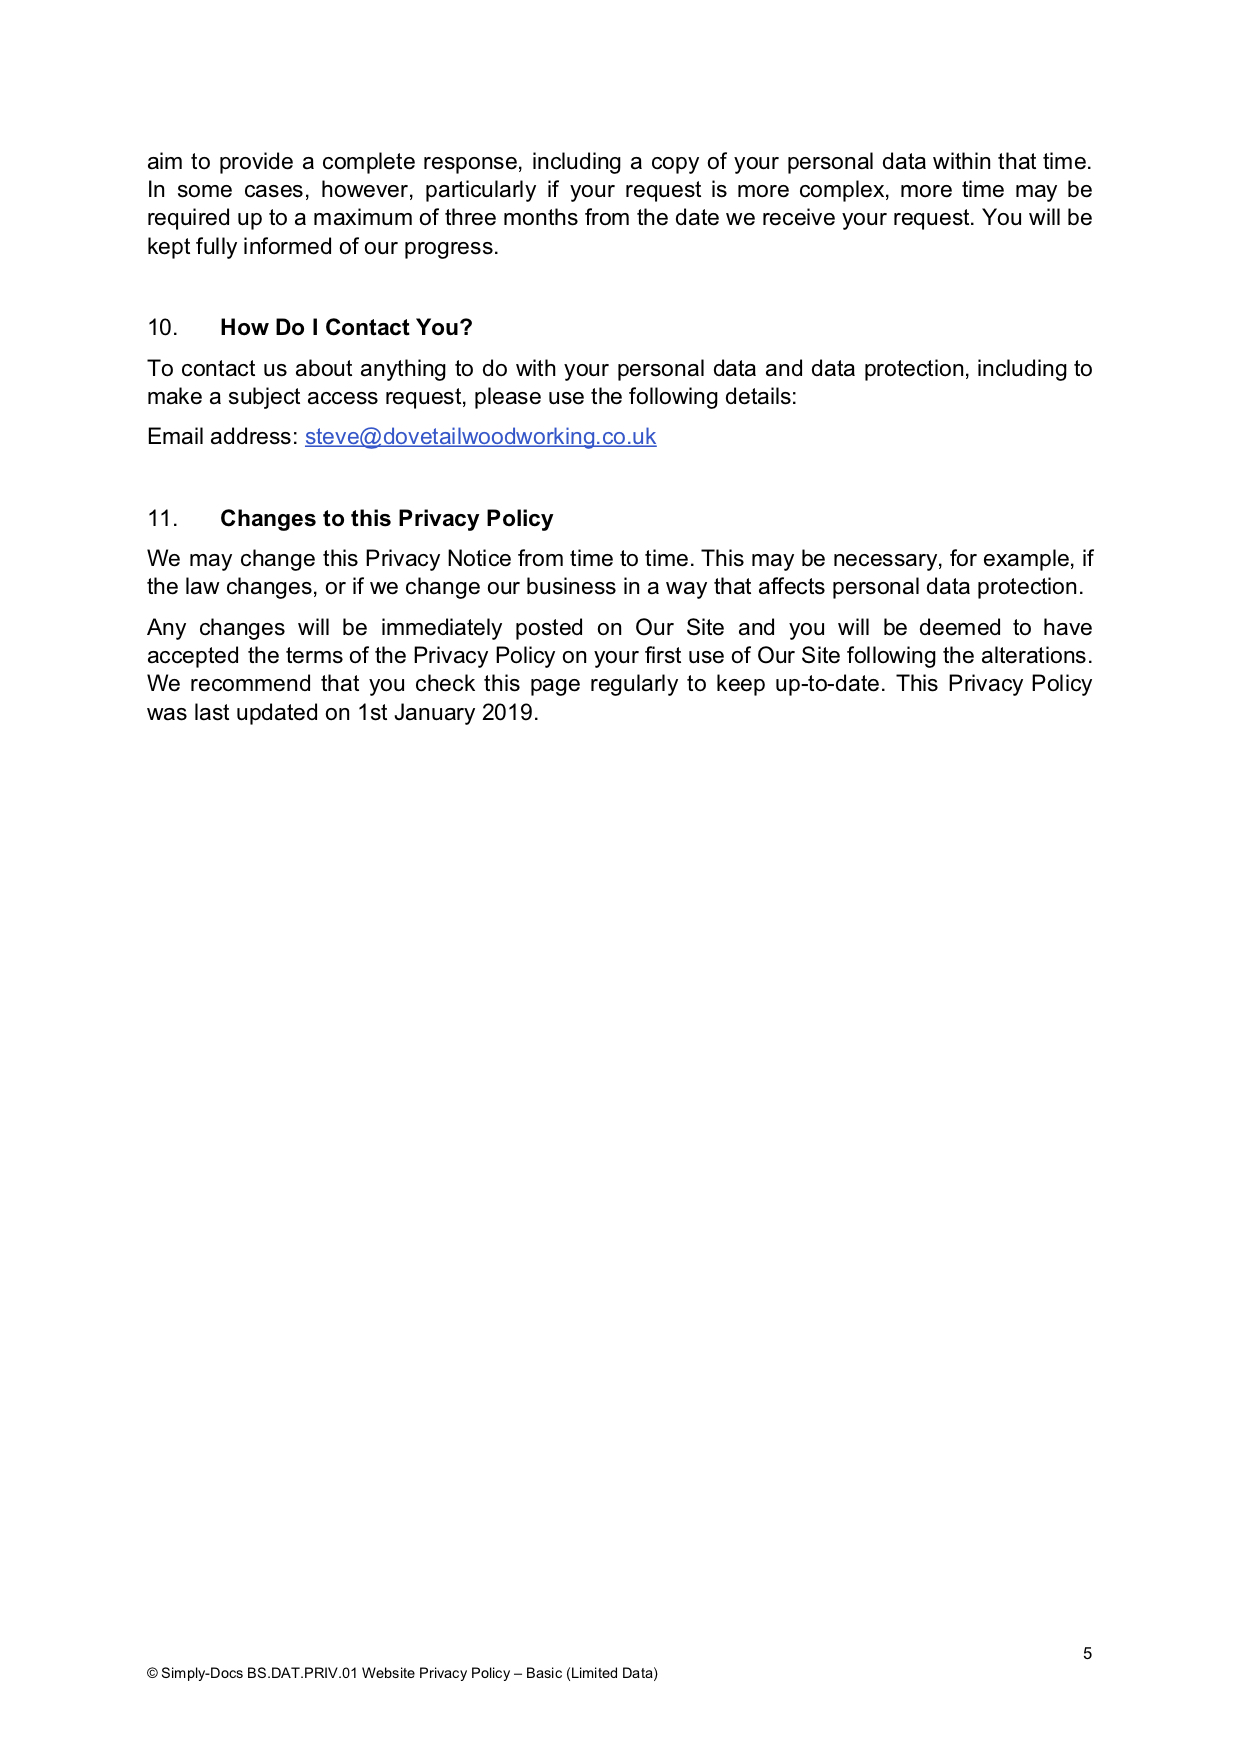 Privacy Policy 5.jpg